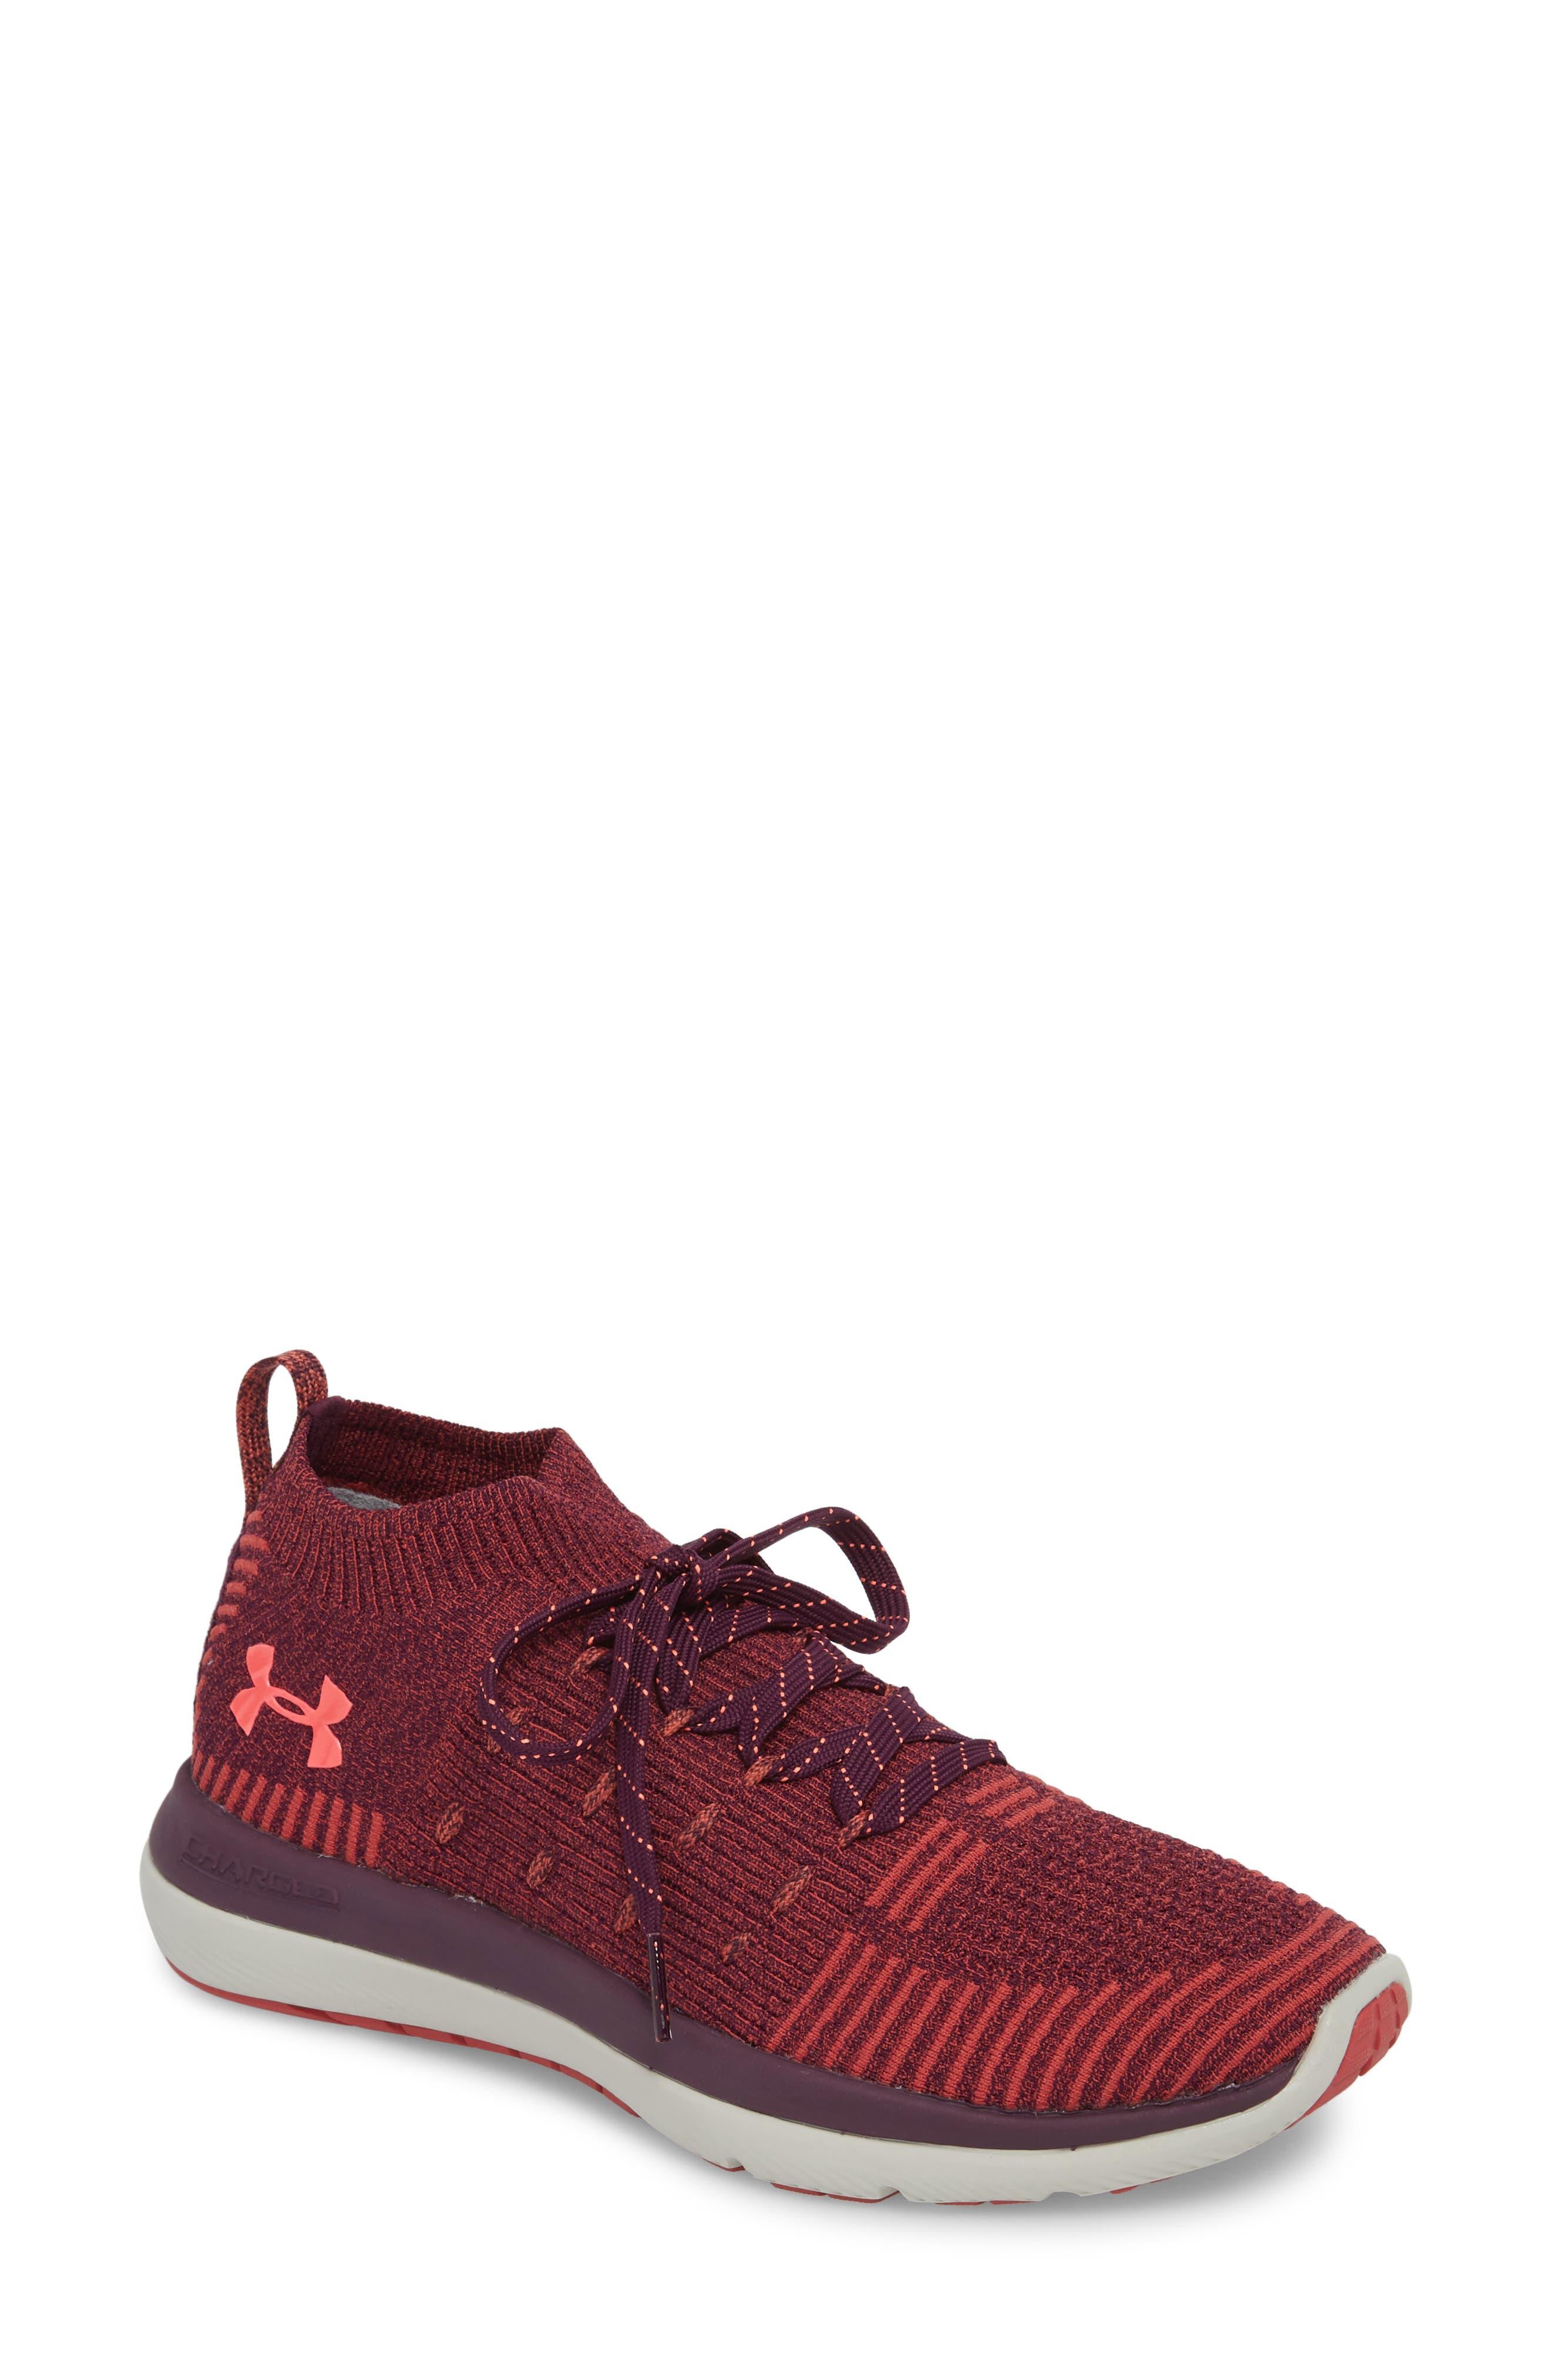 Slingflex Rise Sneaker,                             Main thumbnail 1, color,                             Merlot/ Rustic Red/ Brilliance